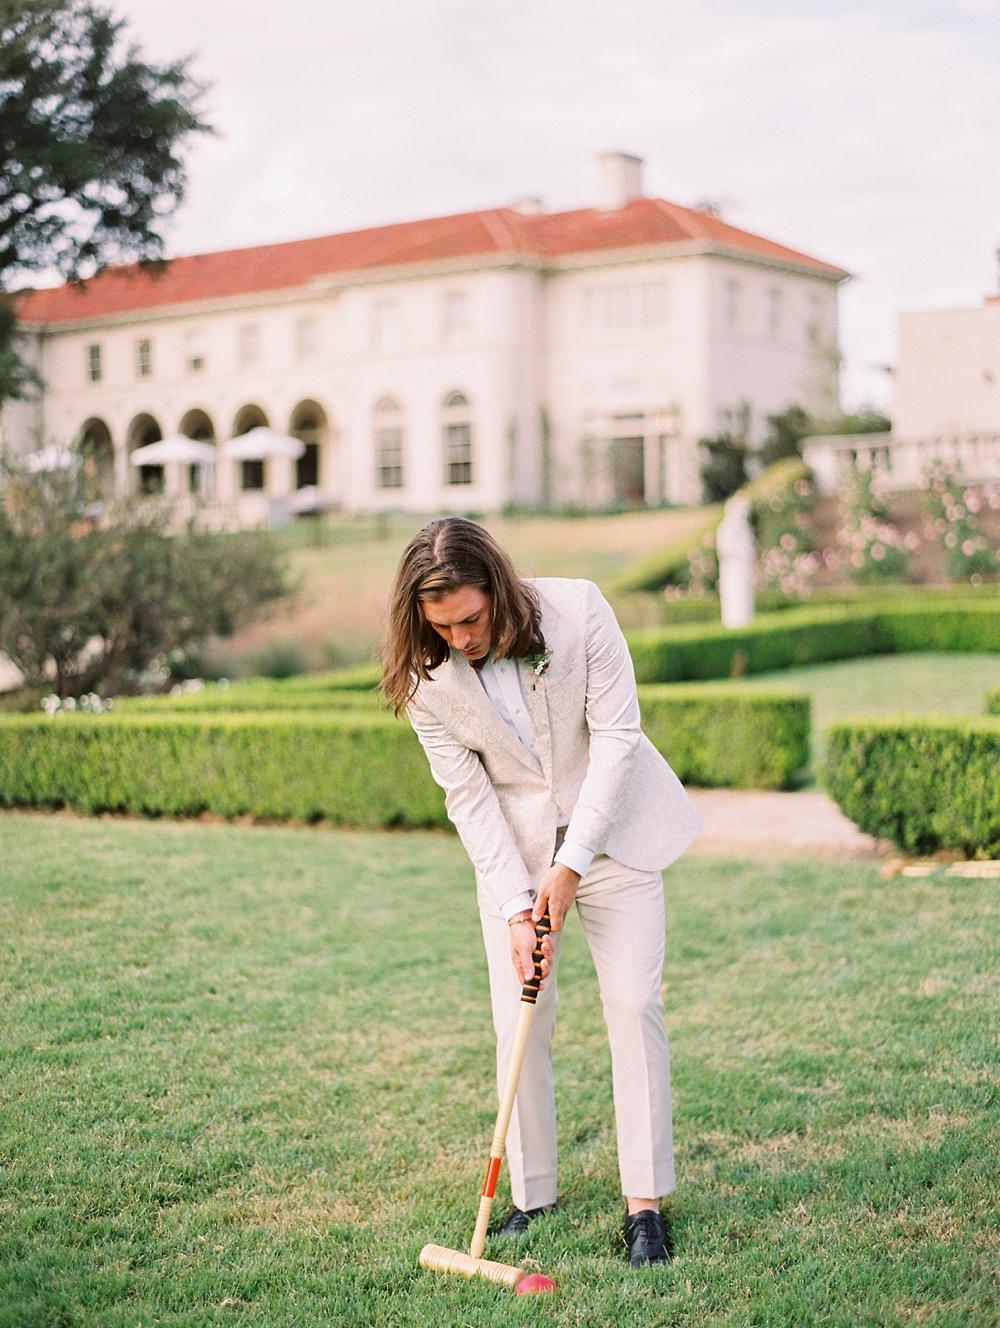 kristin-la-voie-photography-Austin-Wedding-Boudoir-Photographer-Commodore-Perry-Estate-48